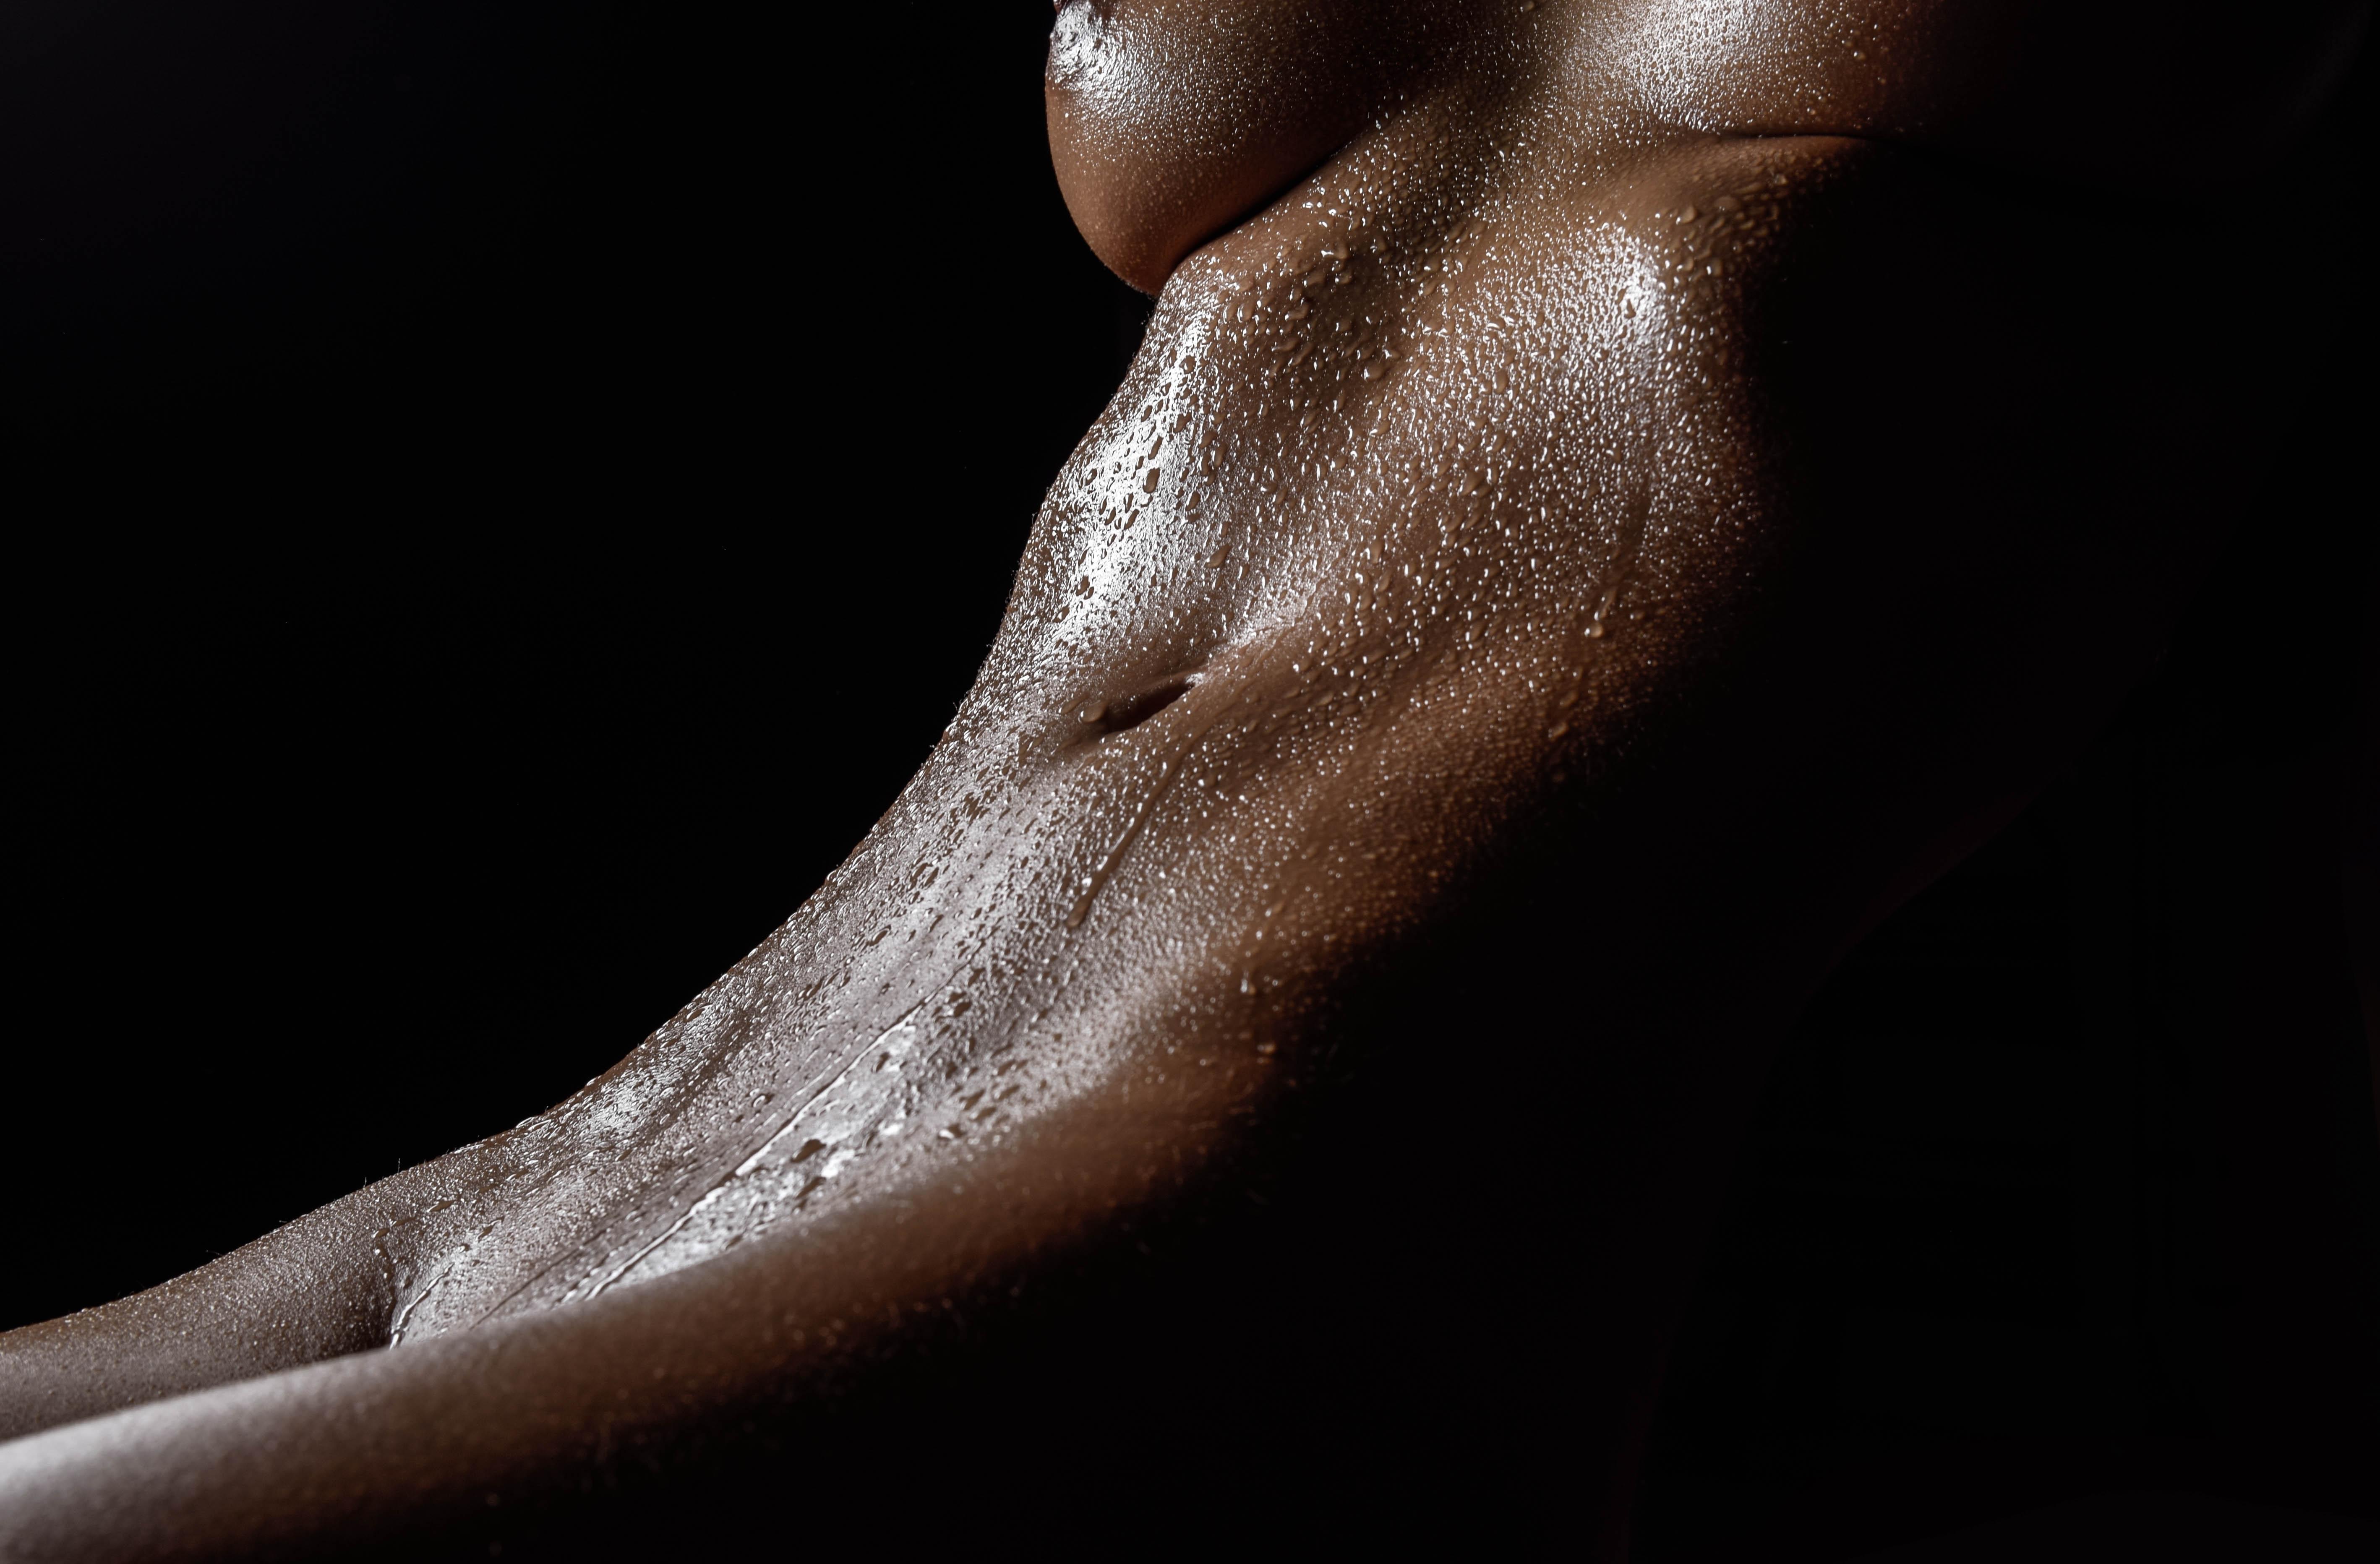 Photographer, Colin Solomon, Edited, Jess Sexton, Retoucher, Beauty Exposed, Hemel Hempstead, Nude, Nude art, Water, Drops, Bodyscapes, Low key, Lighting, Kitti model, Sensual, Bodyscape